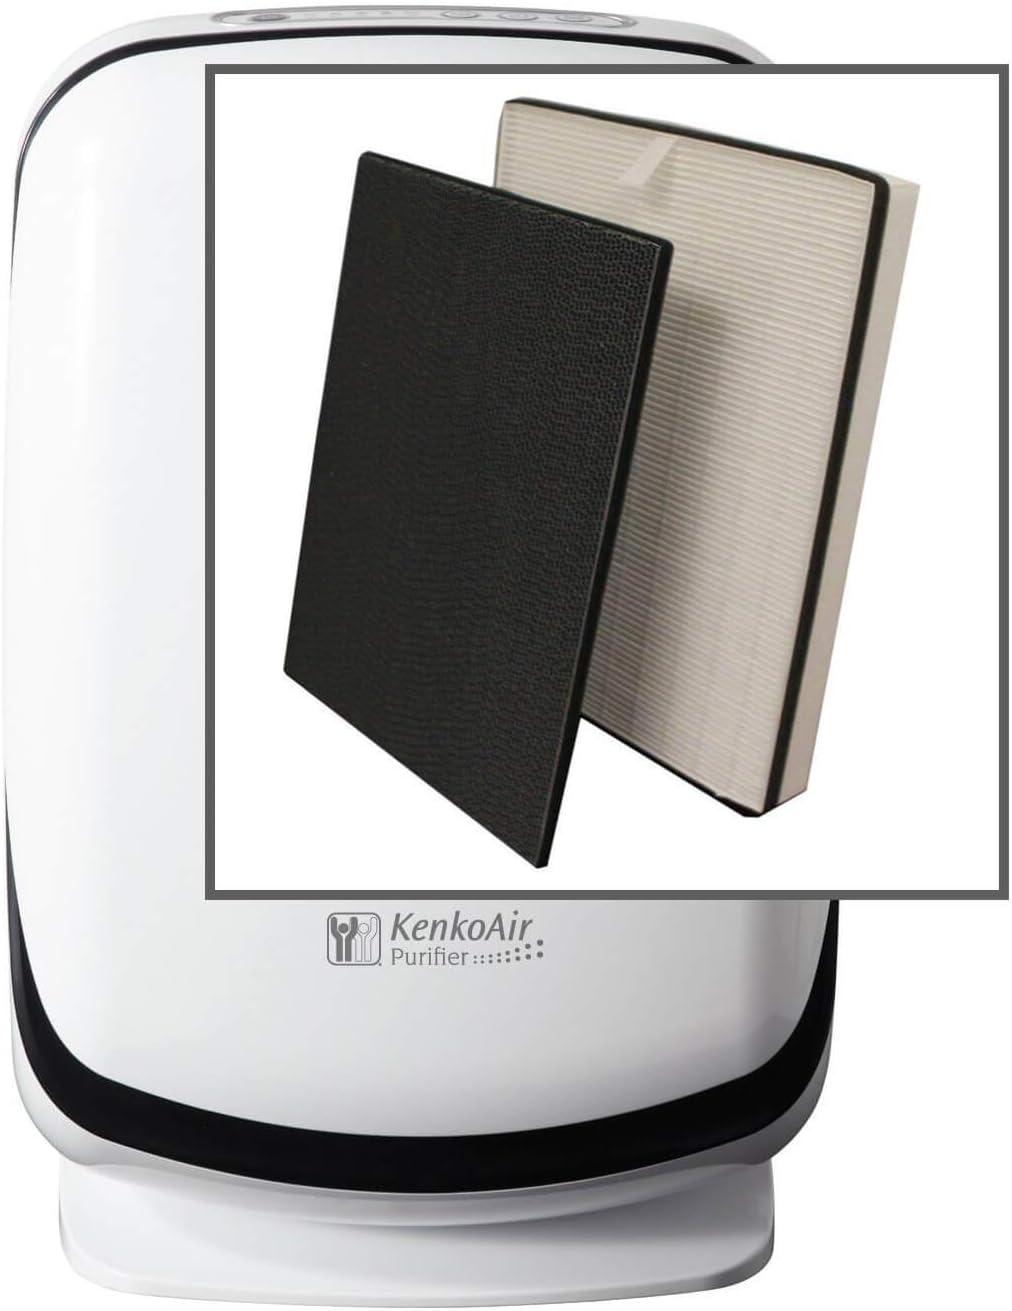 Nikken KenkoAir - Paquete de filtros para purificador HEPA ...